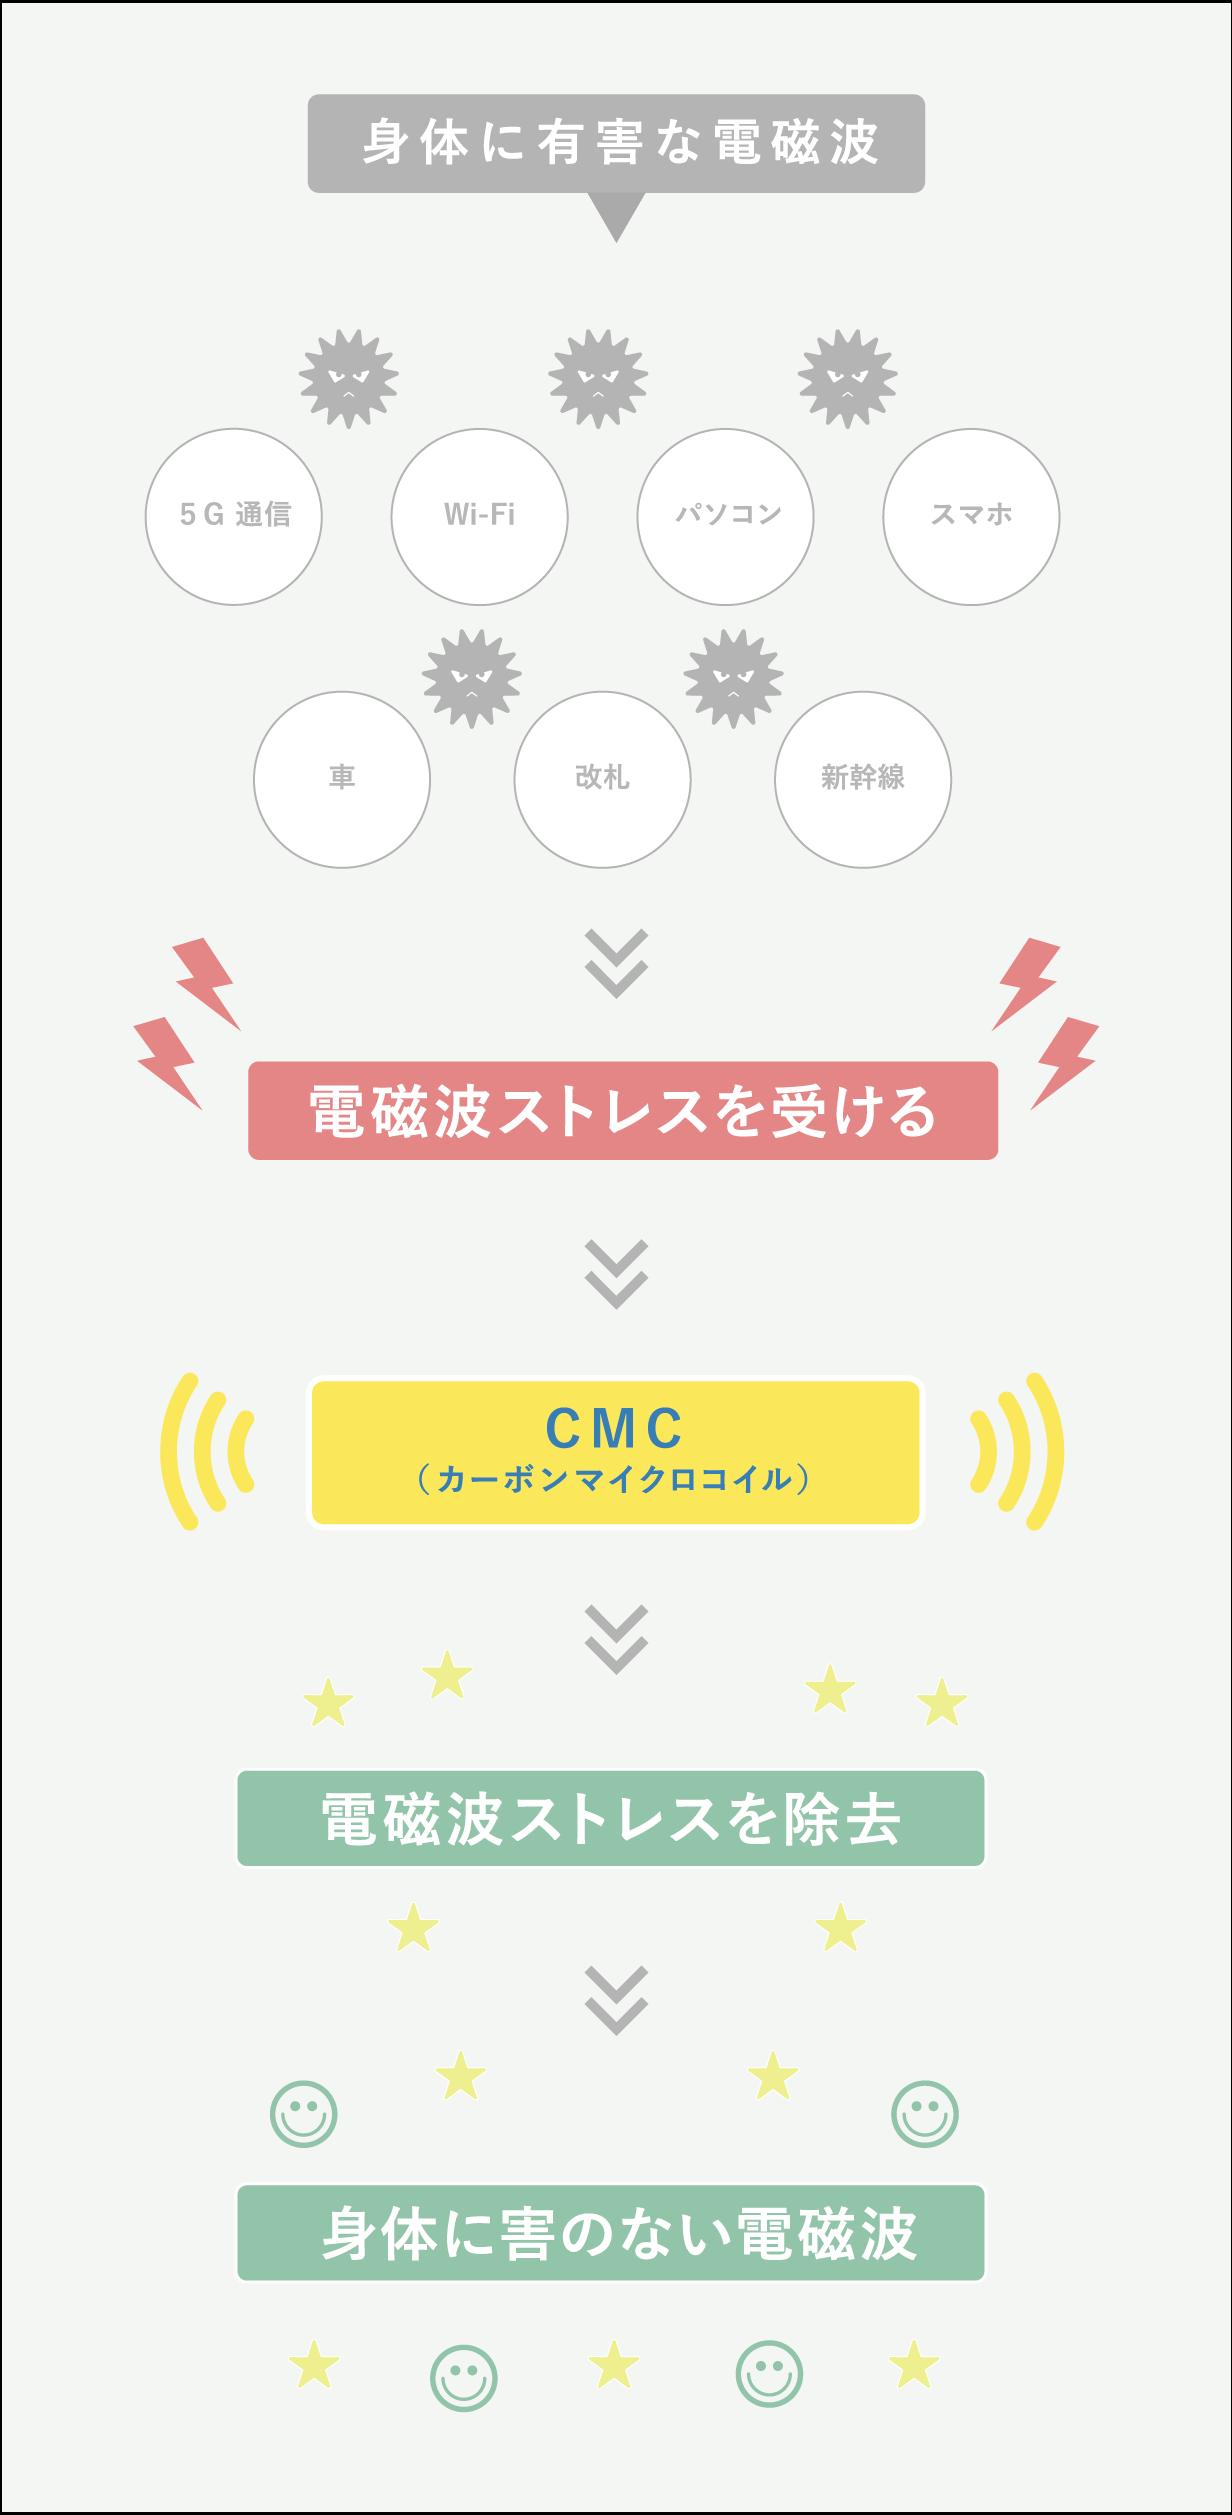 CMC 電磁波障害防御のメカニズム